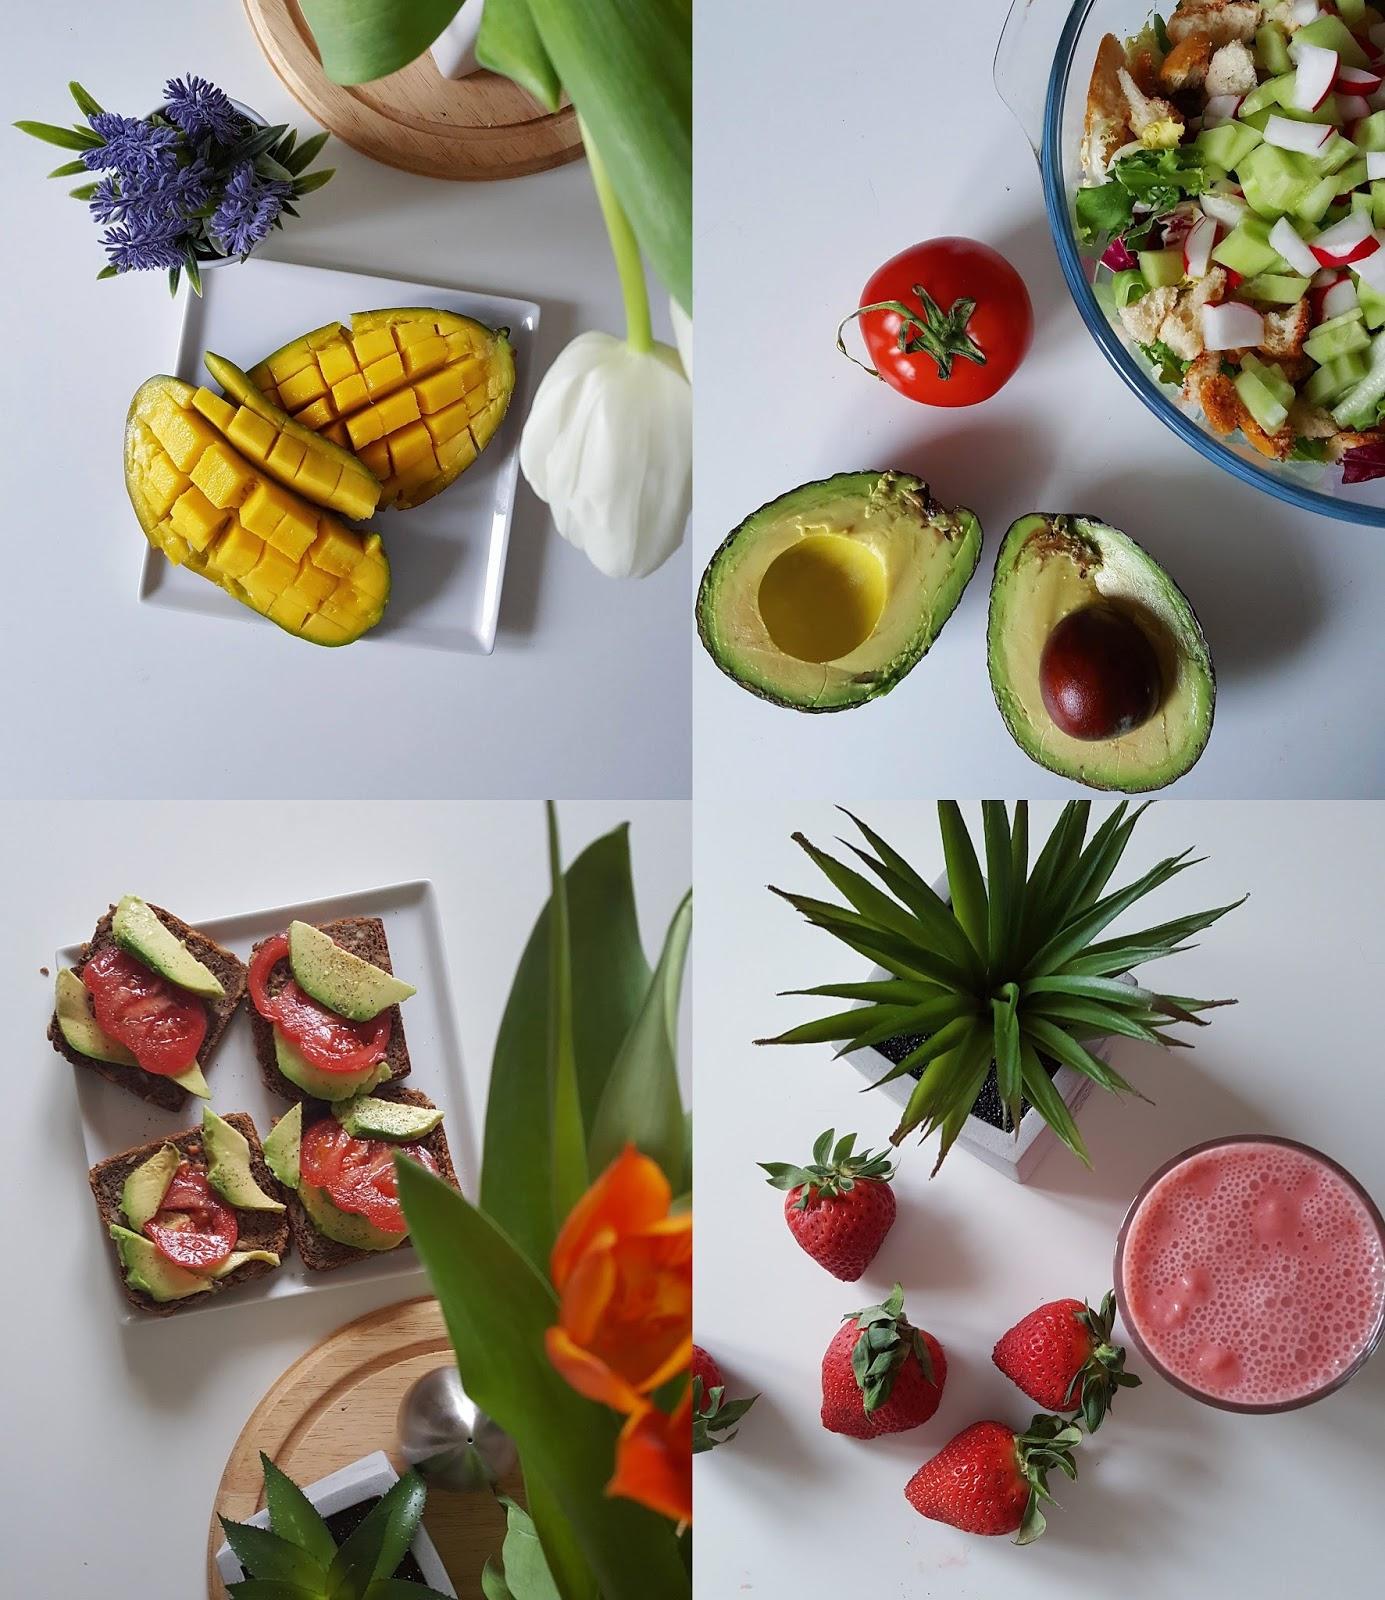 pomysły na smacznie śniadanie